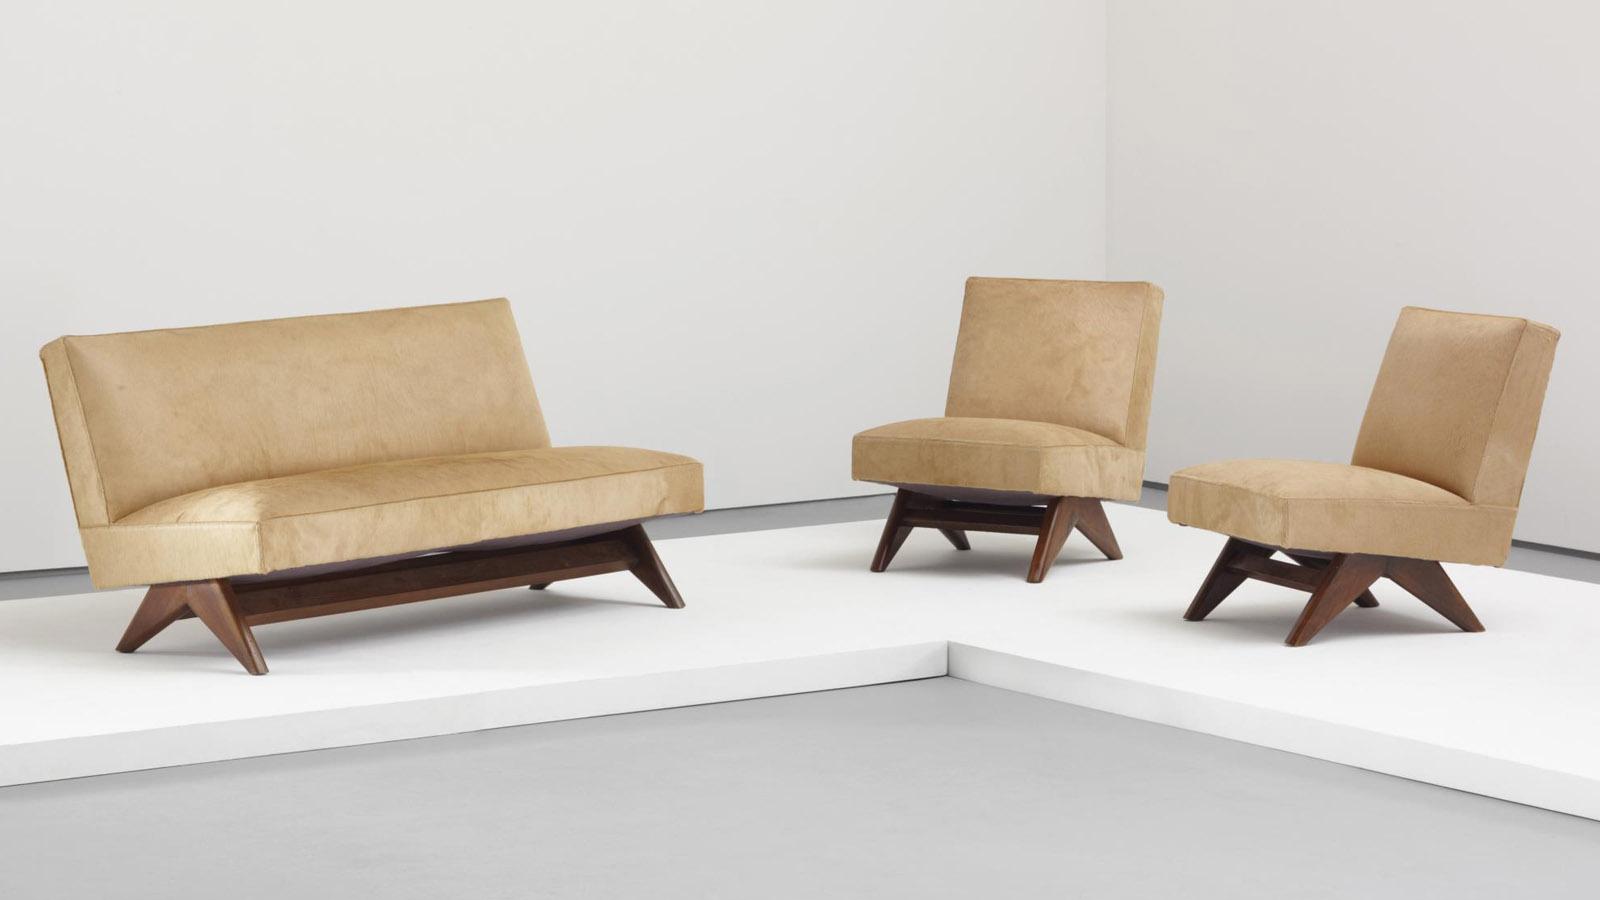 Pierre jeanneret: the designer behind le corbusier